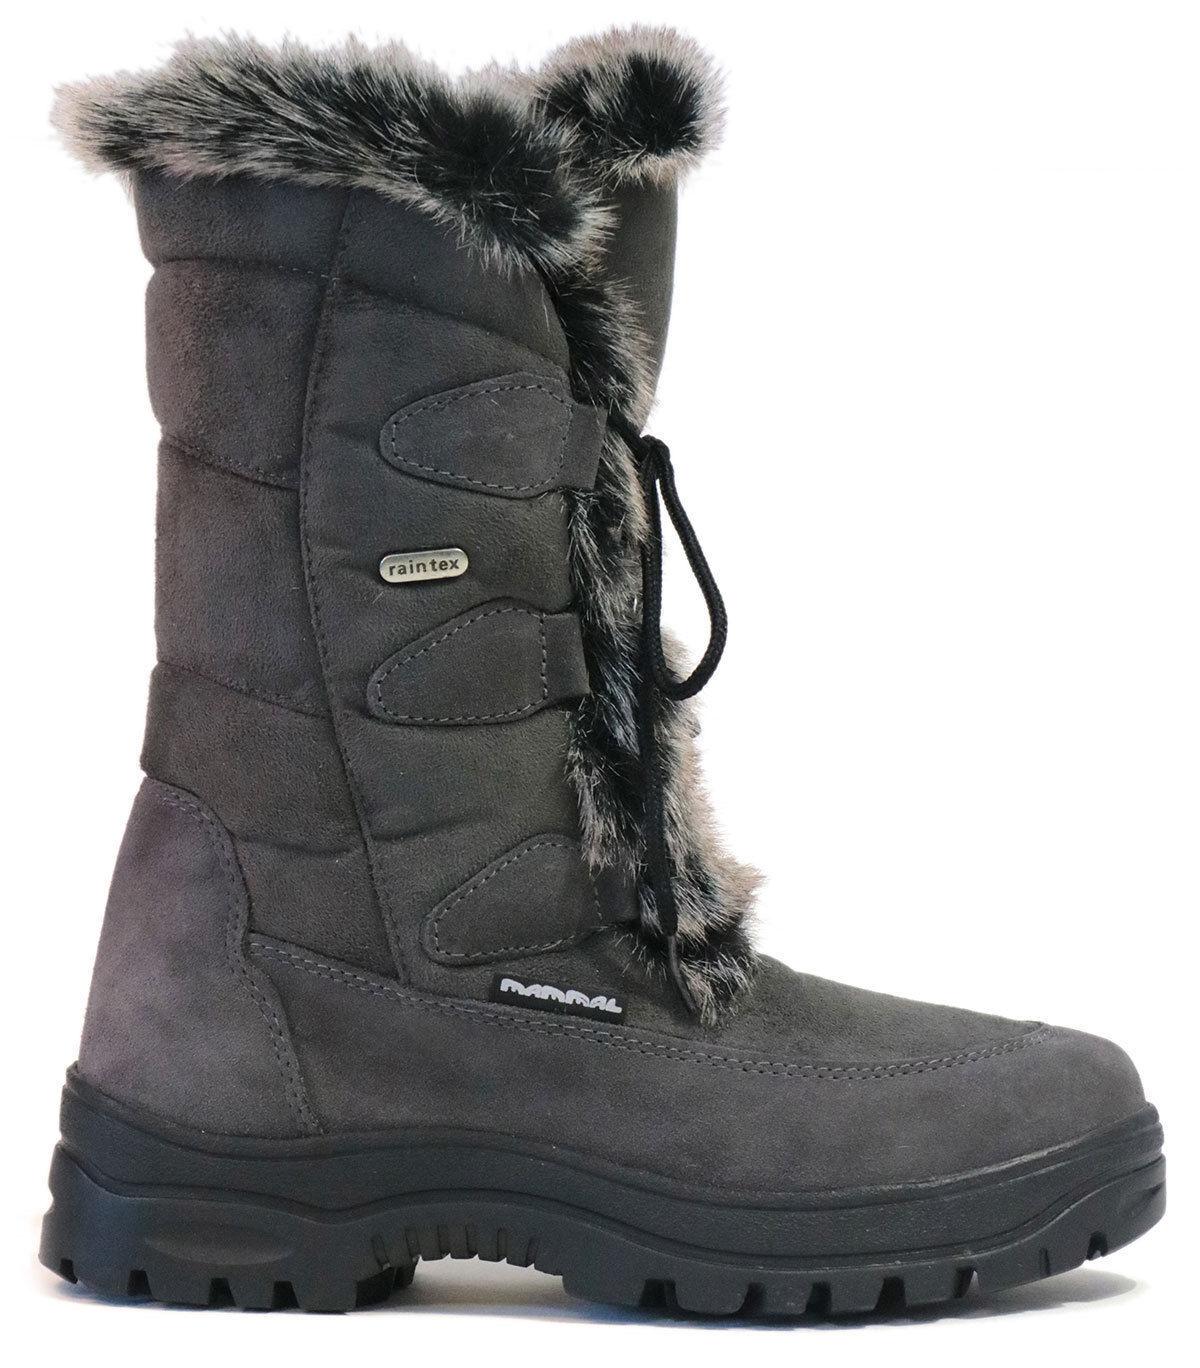 Mamífero Oribi OC OC OC Snowbotas Impermeable Cálido Apres Ski Antideslizante Invierno desplazamientos dfd085